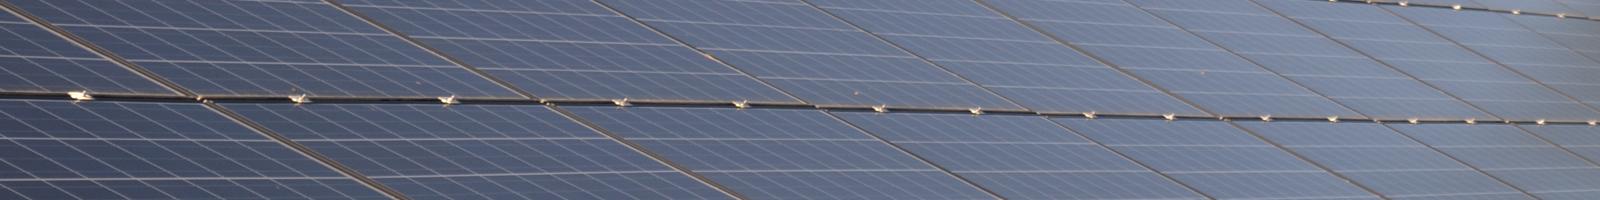 solar_panels3